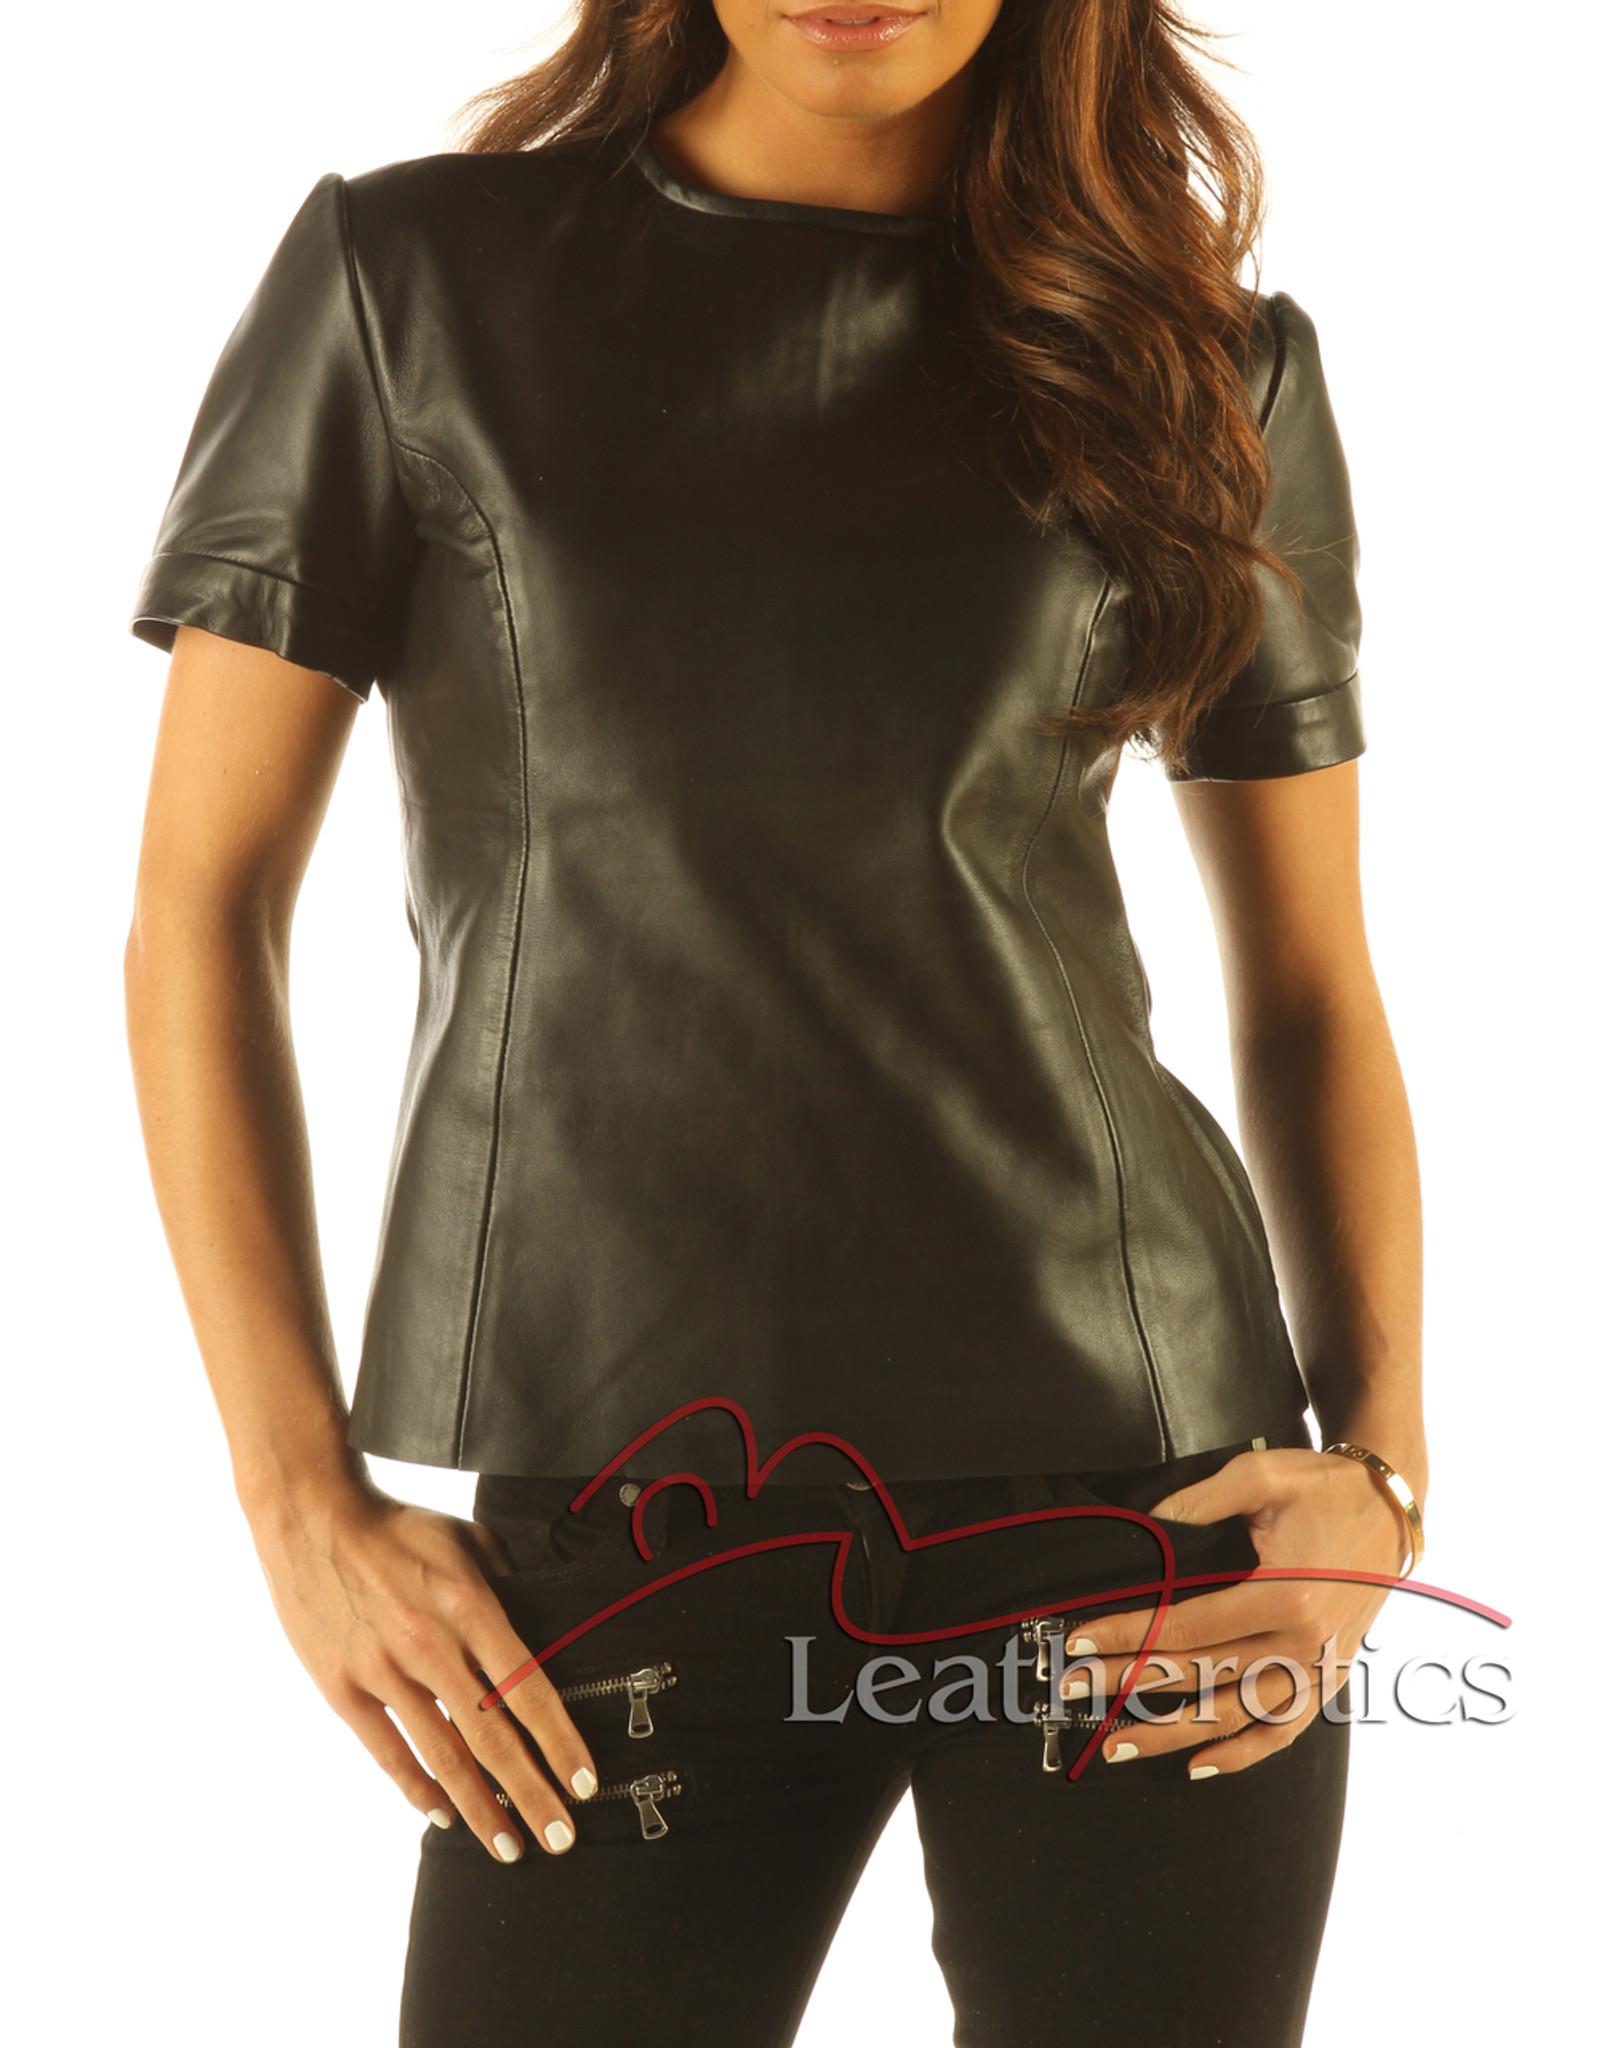 14cf2658b4 Full Grain Leather T-Shirt Light Top Celebrity T-shirt Vest With Zip Back  ...